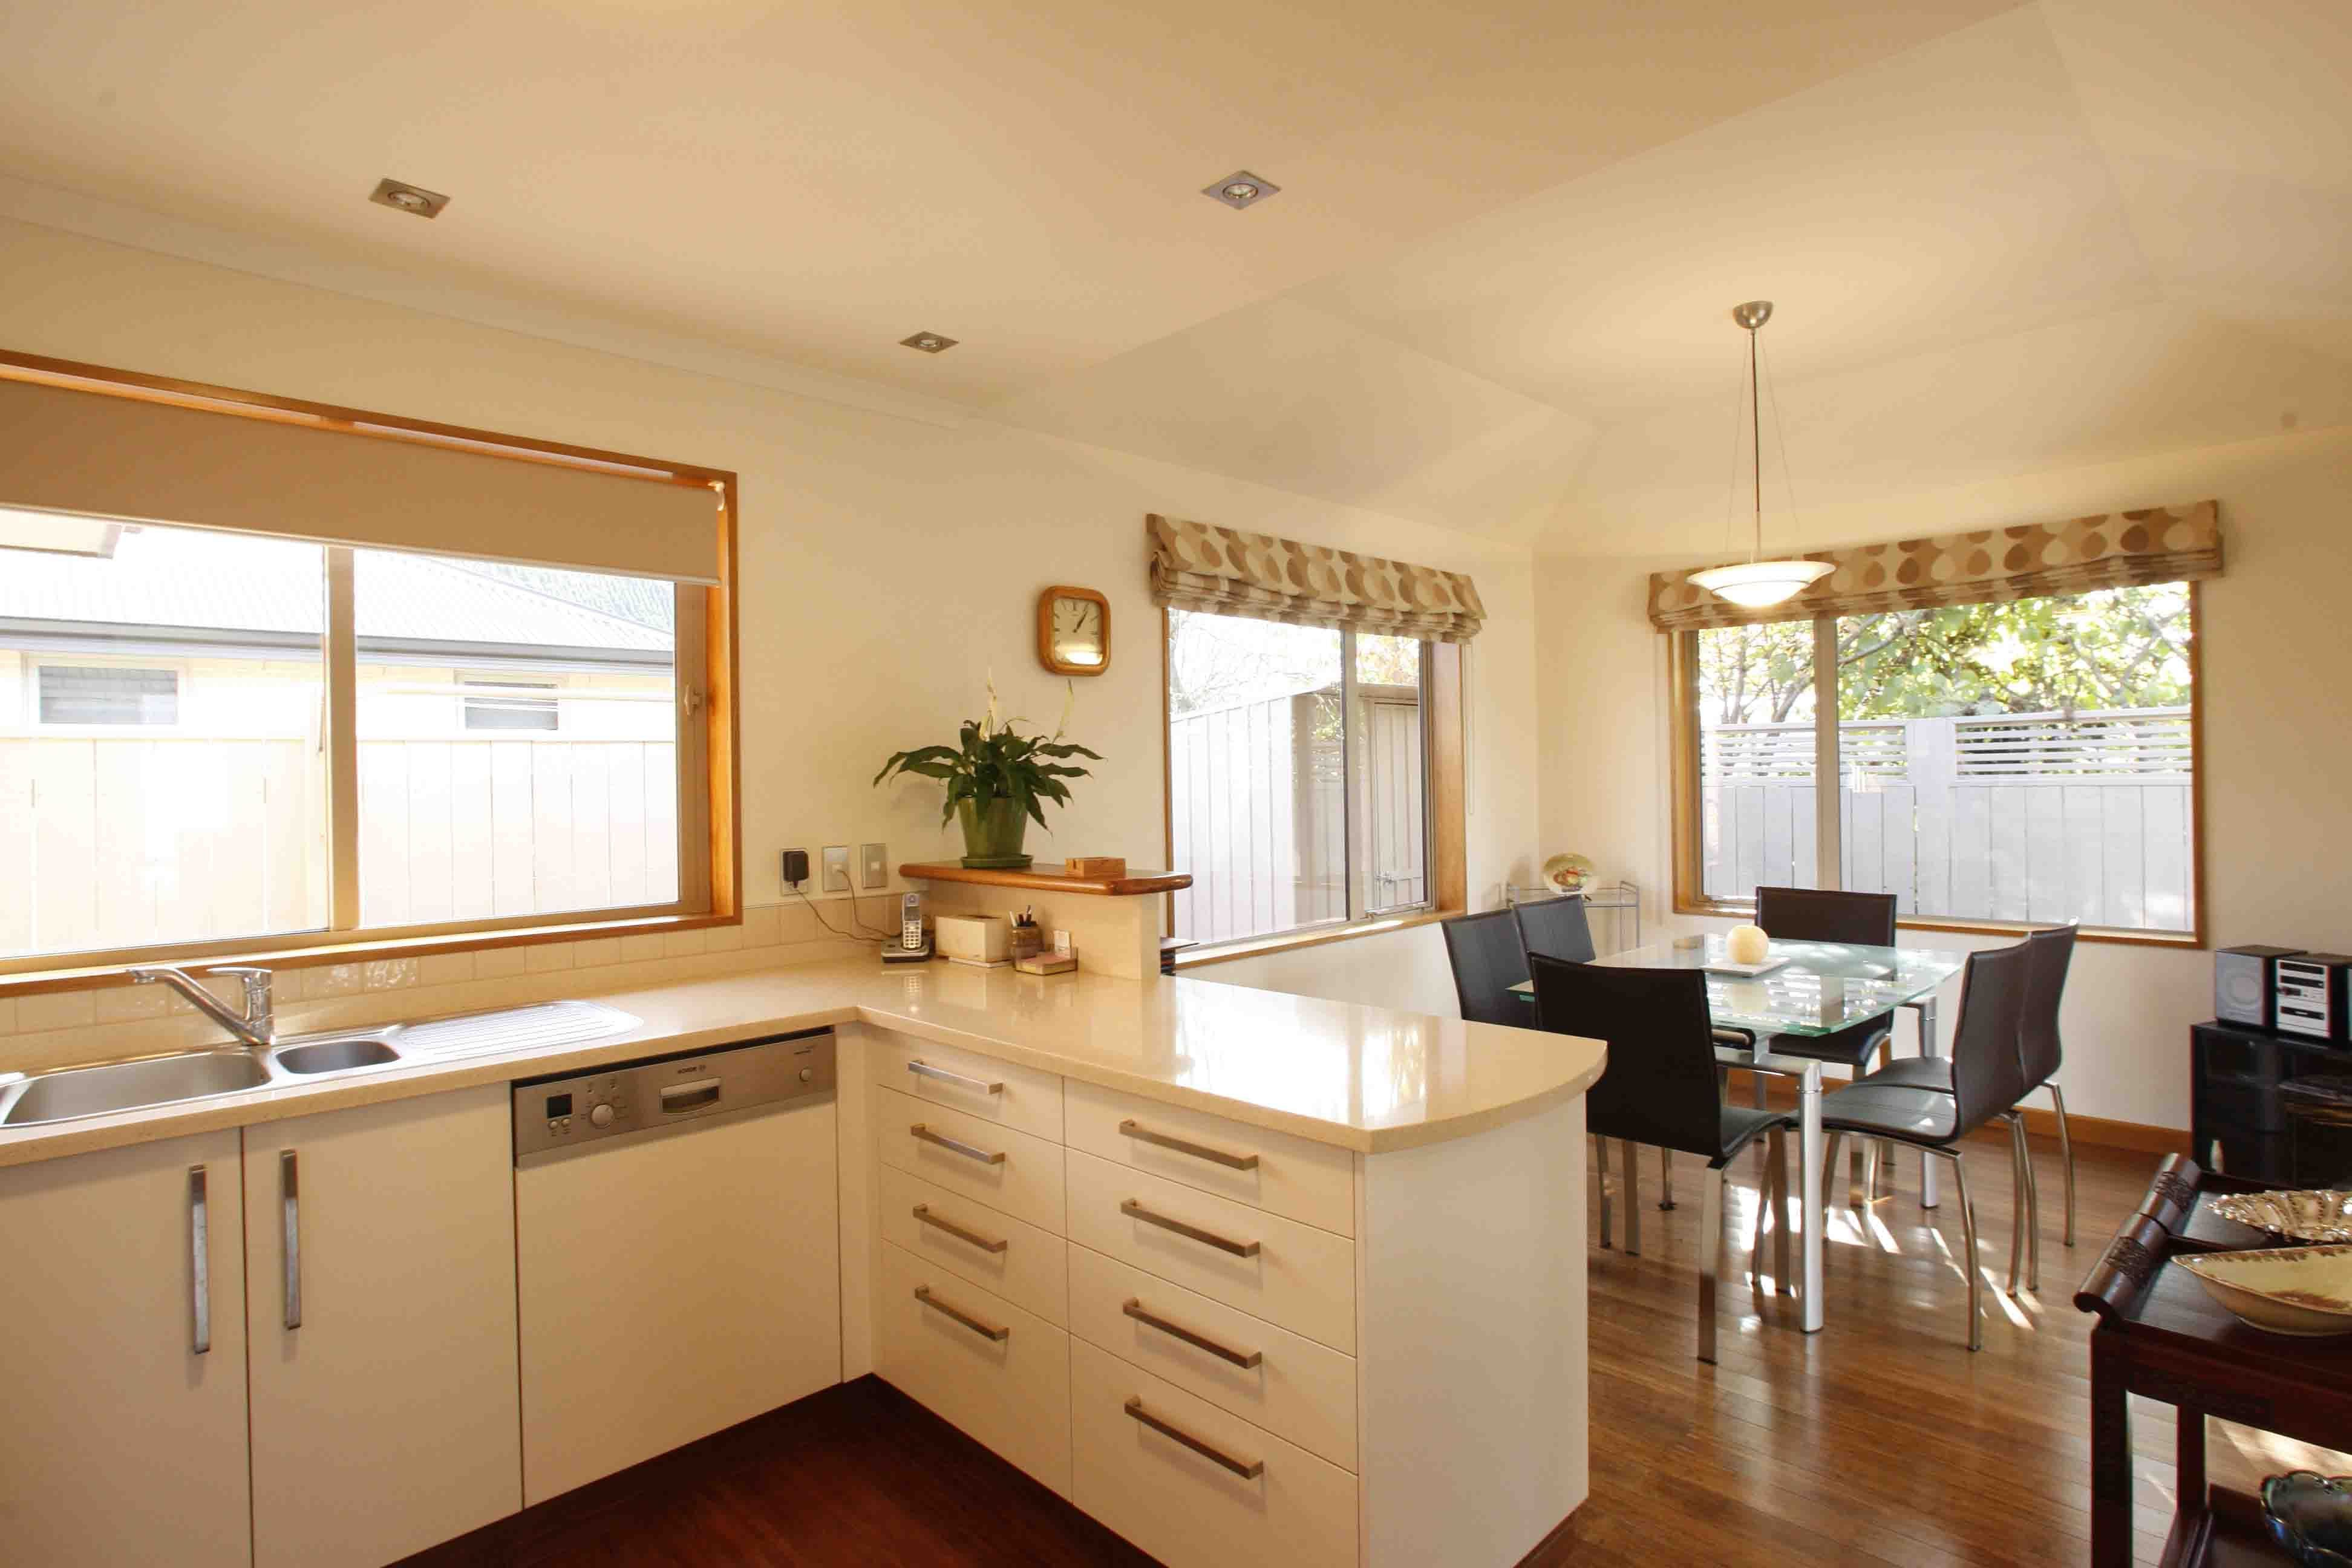 Top 13 Materials for Kitchen Countertops | Kitchen design ...